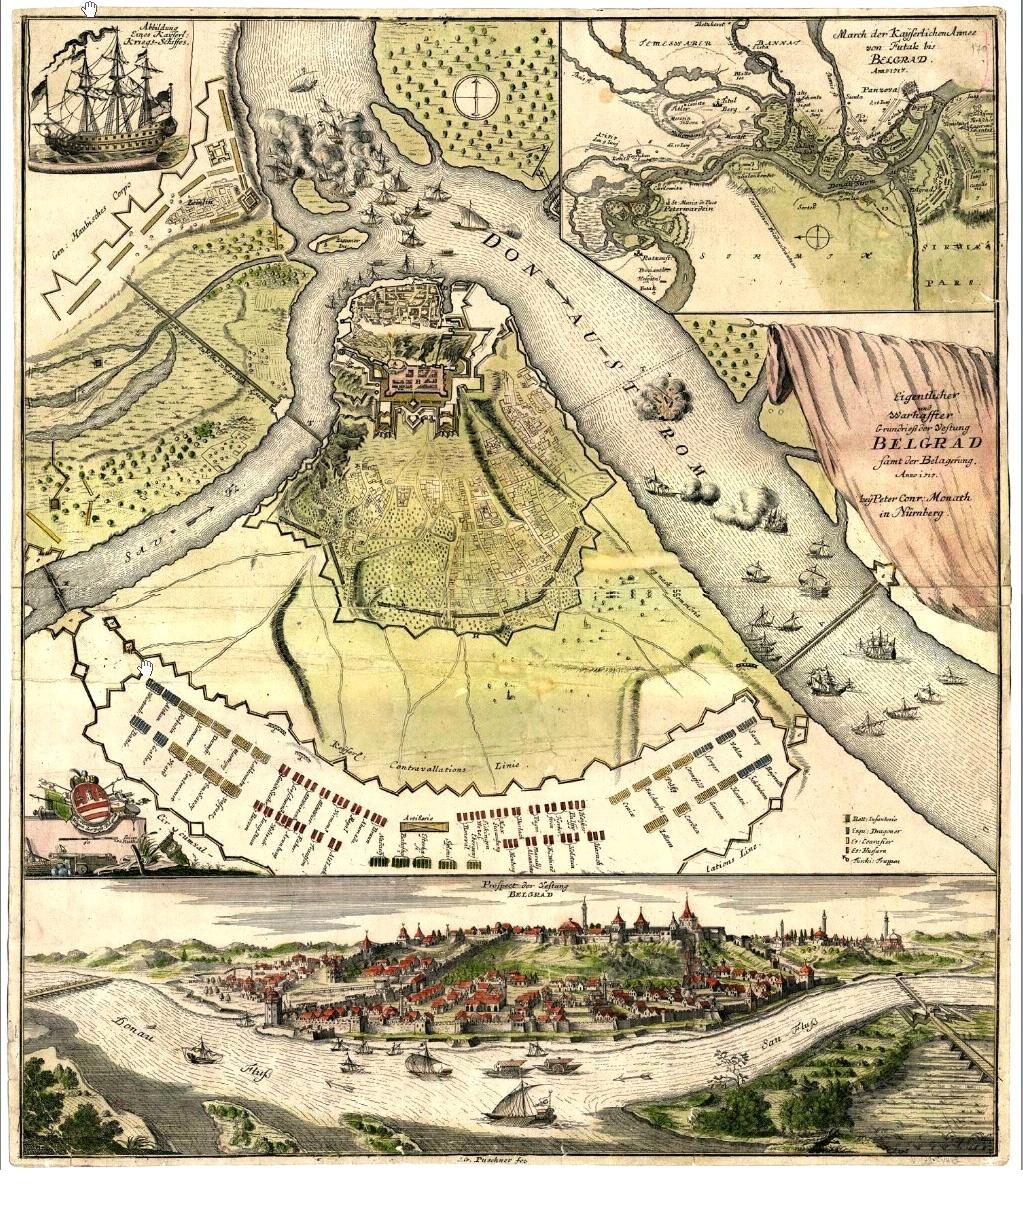 istorijski fragmenti - Page 31 Mapa1717